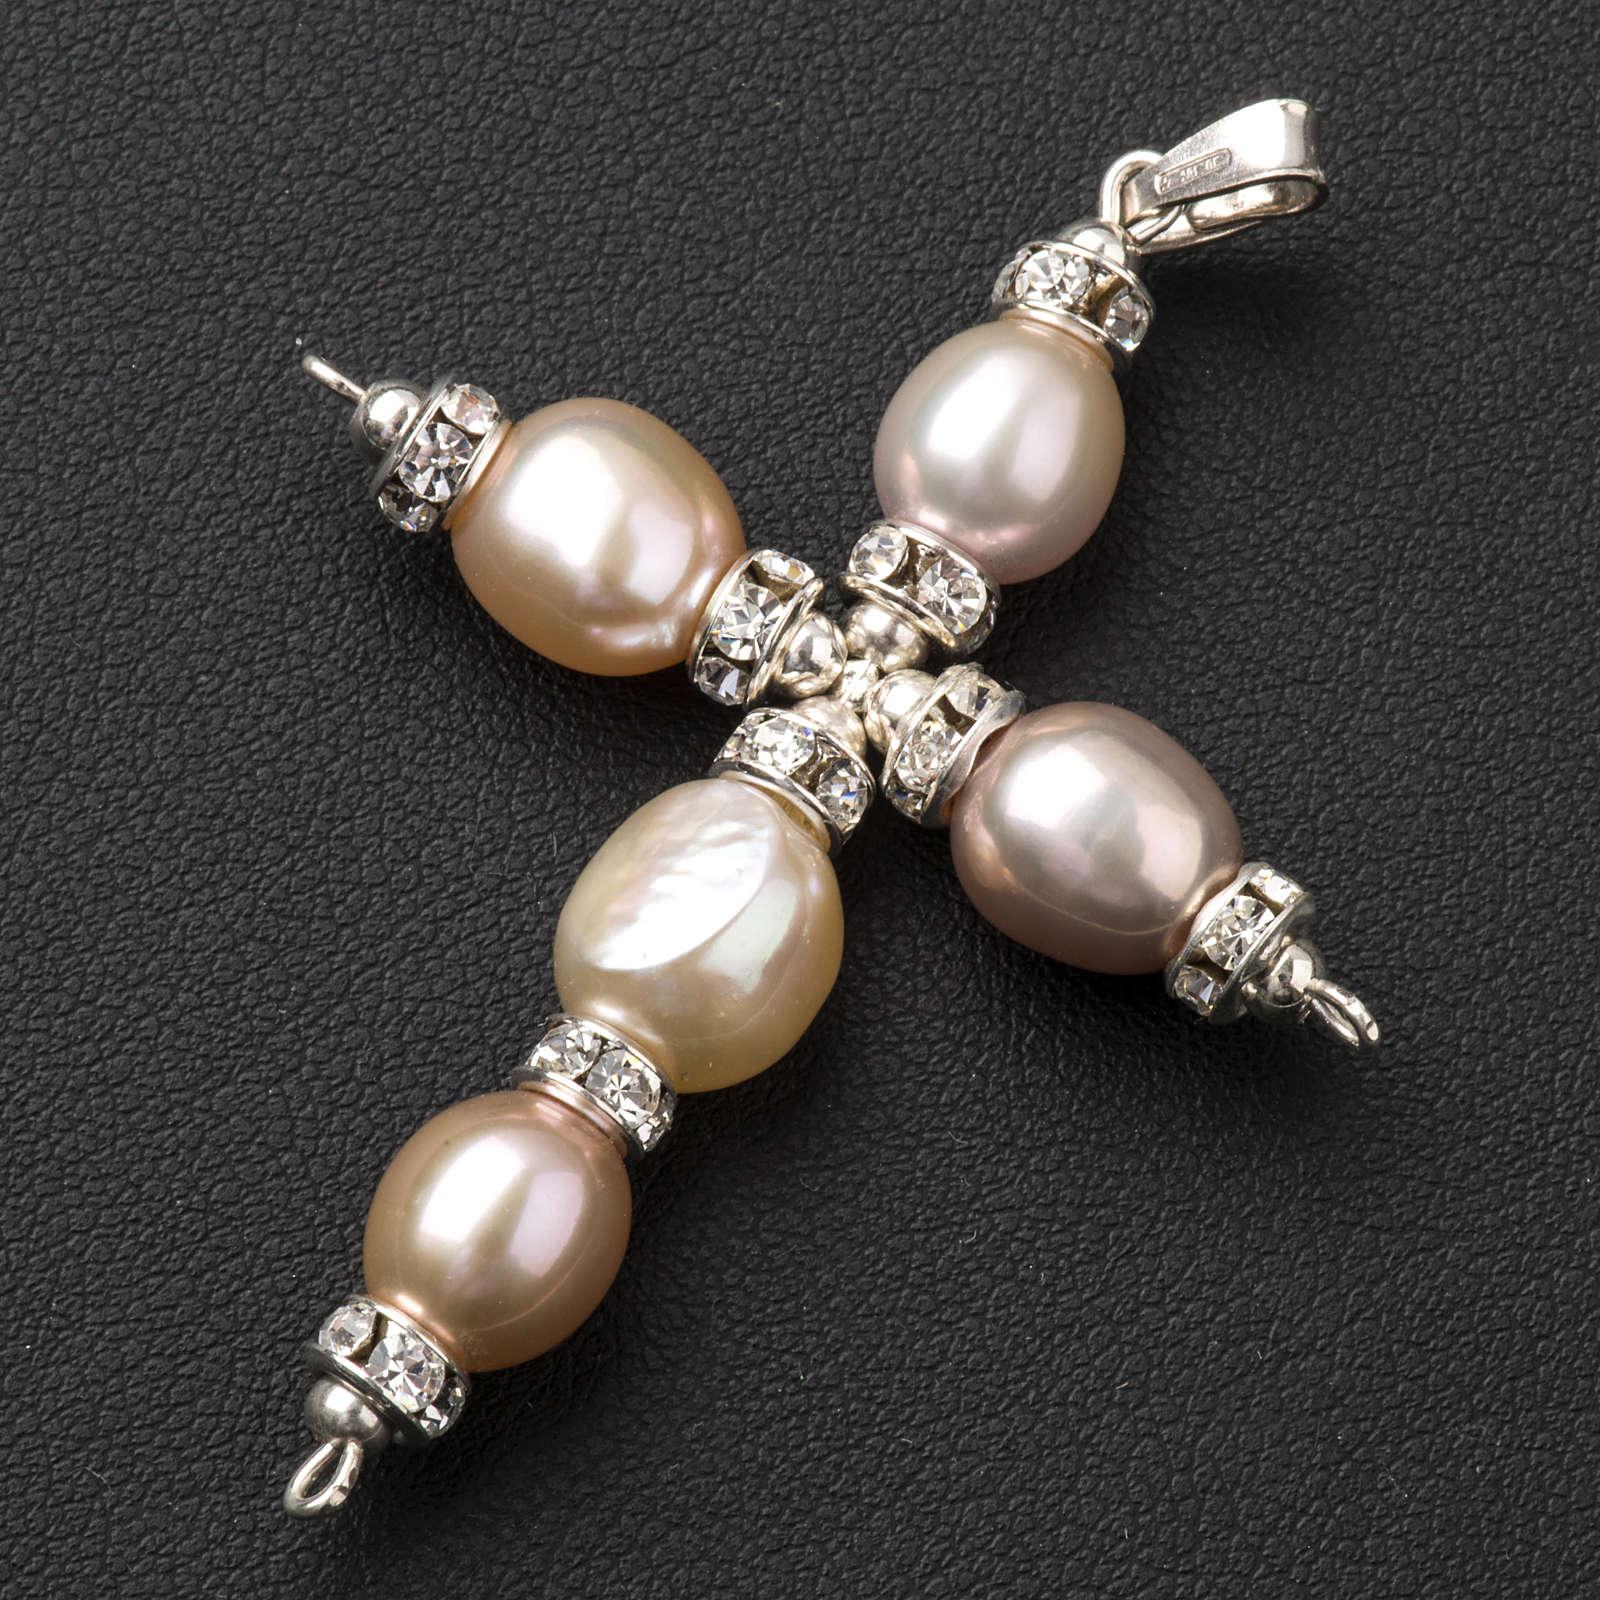 Croce pendente Svarowski e perle 4